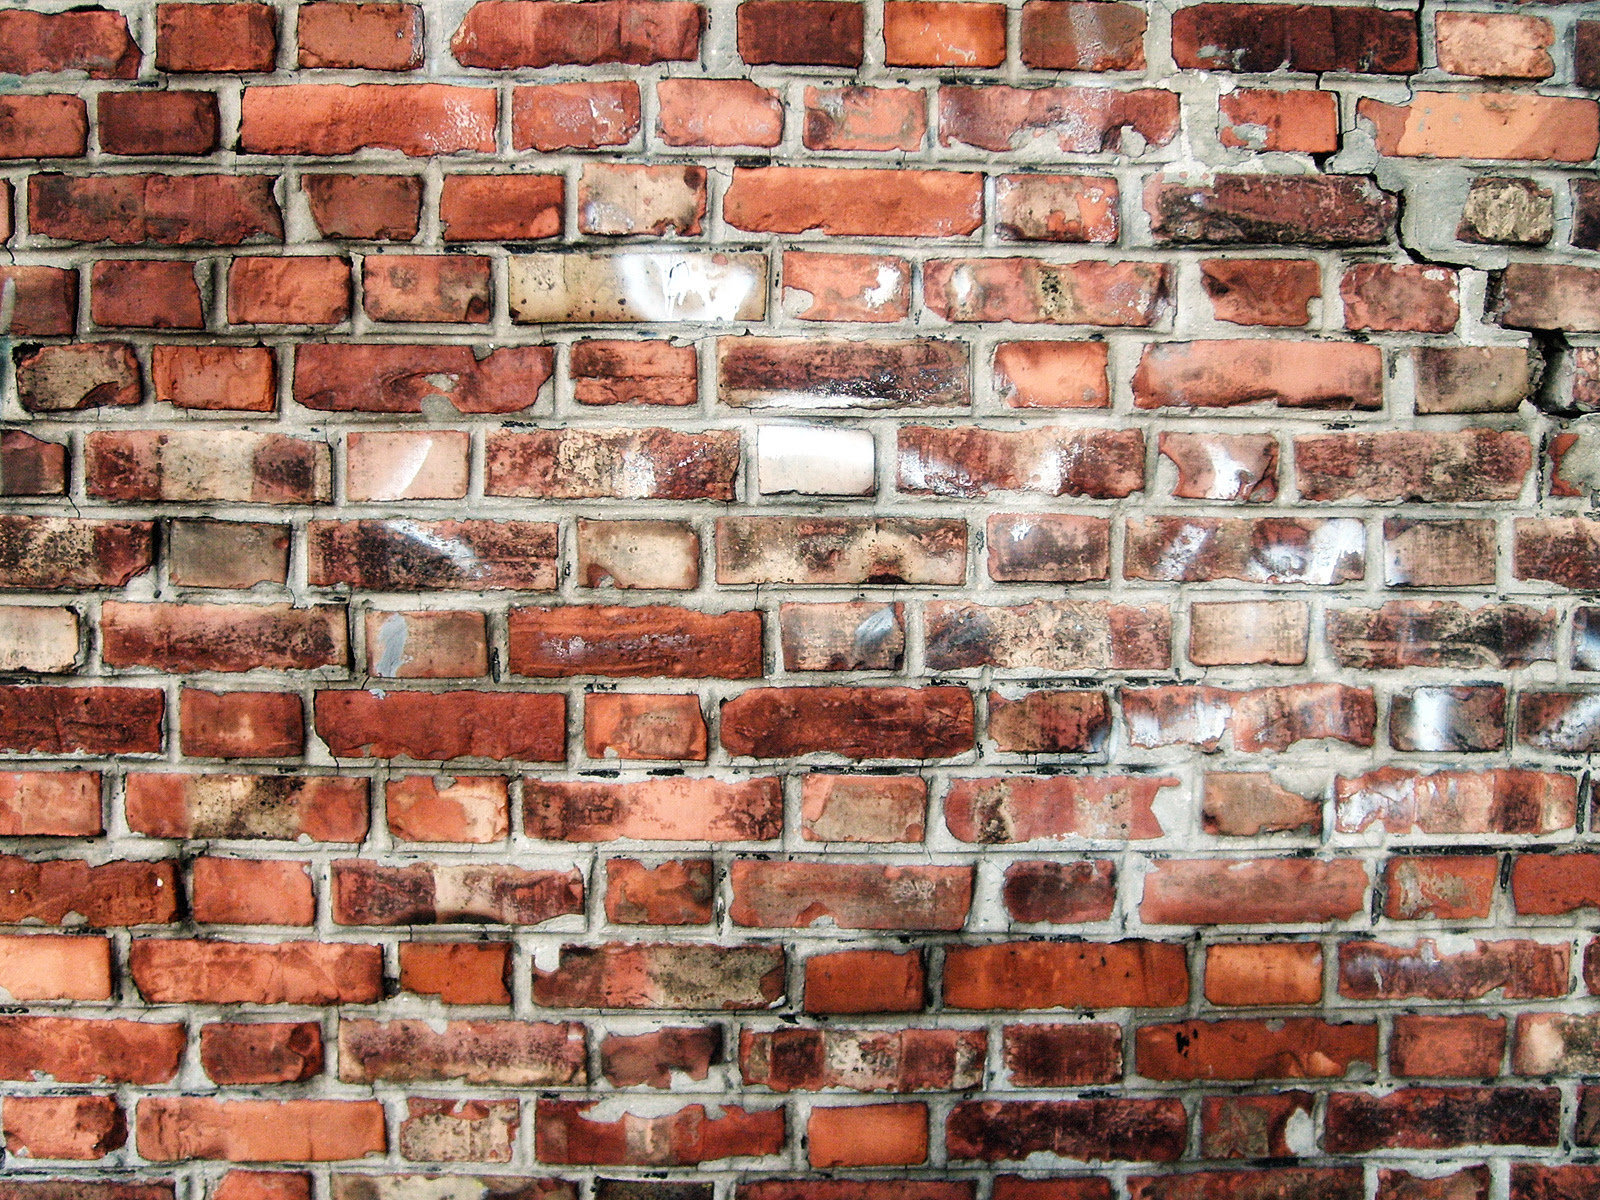 File:Brick wall in Flemish bond.jpg  Wikimedia Commons